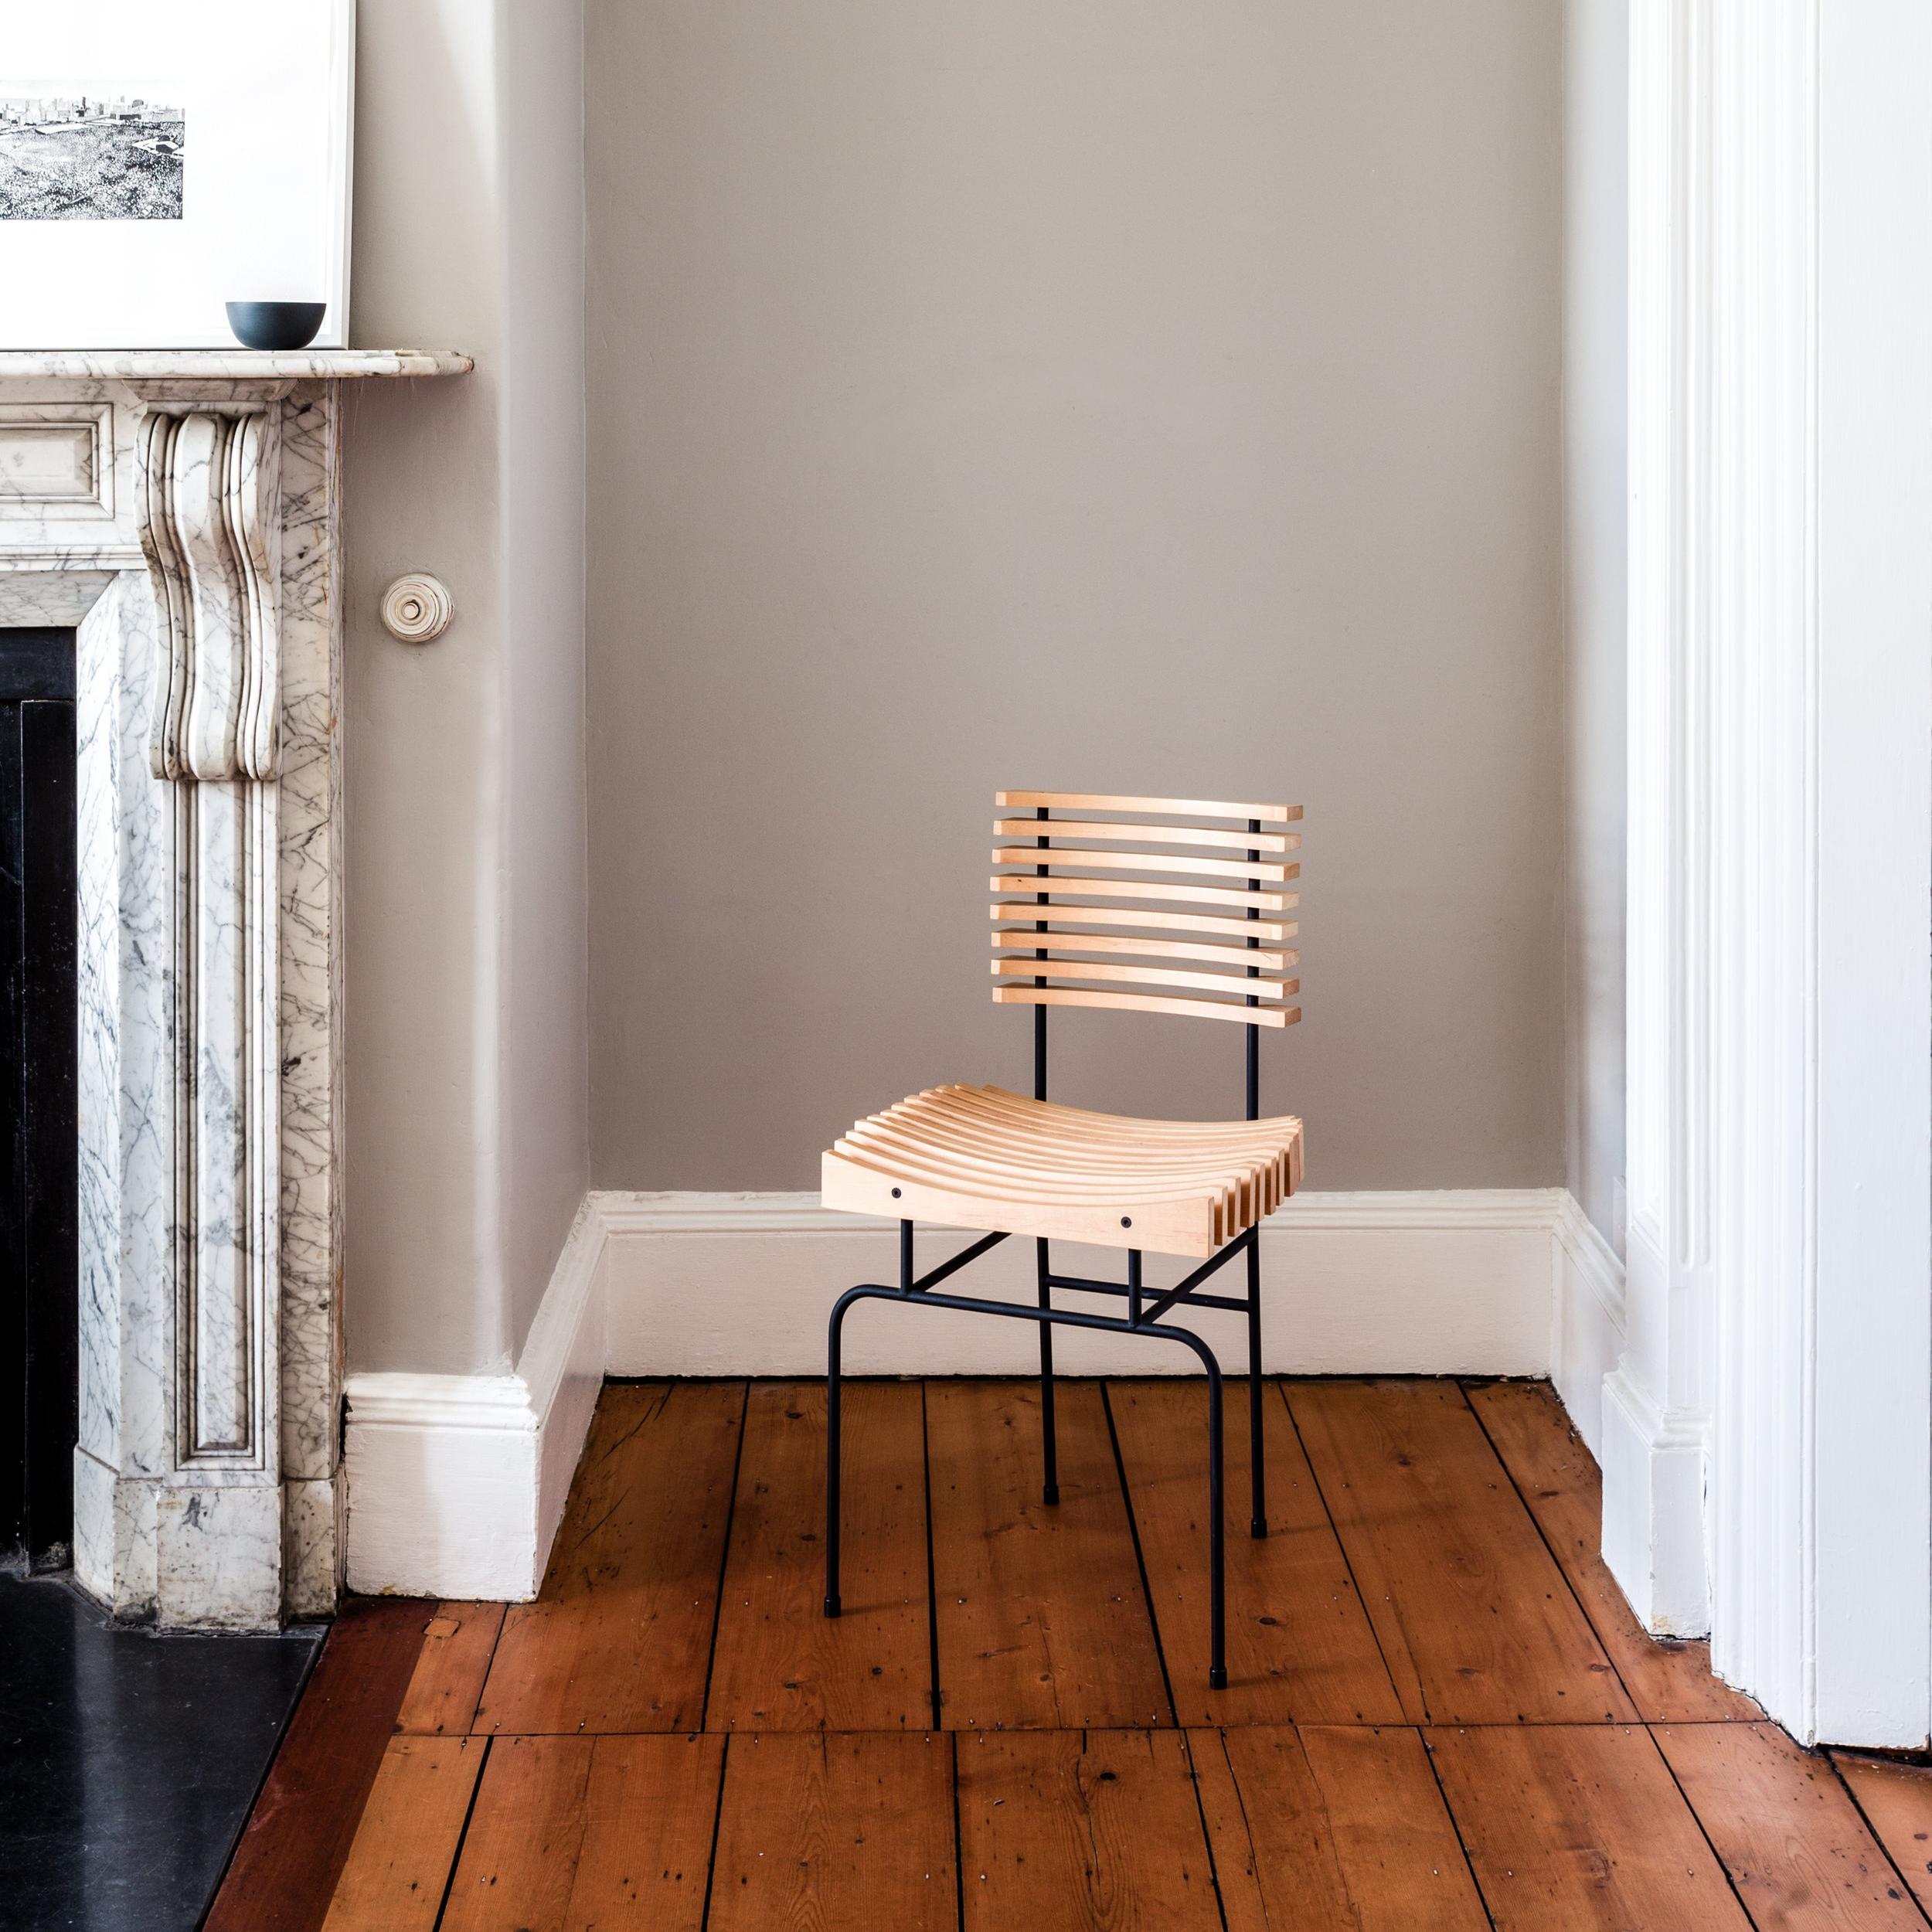 Slatted Chair - comfortable, elegant home or restaurant dining